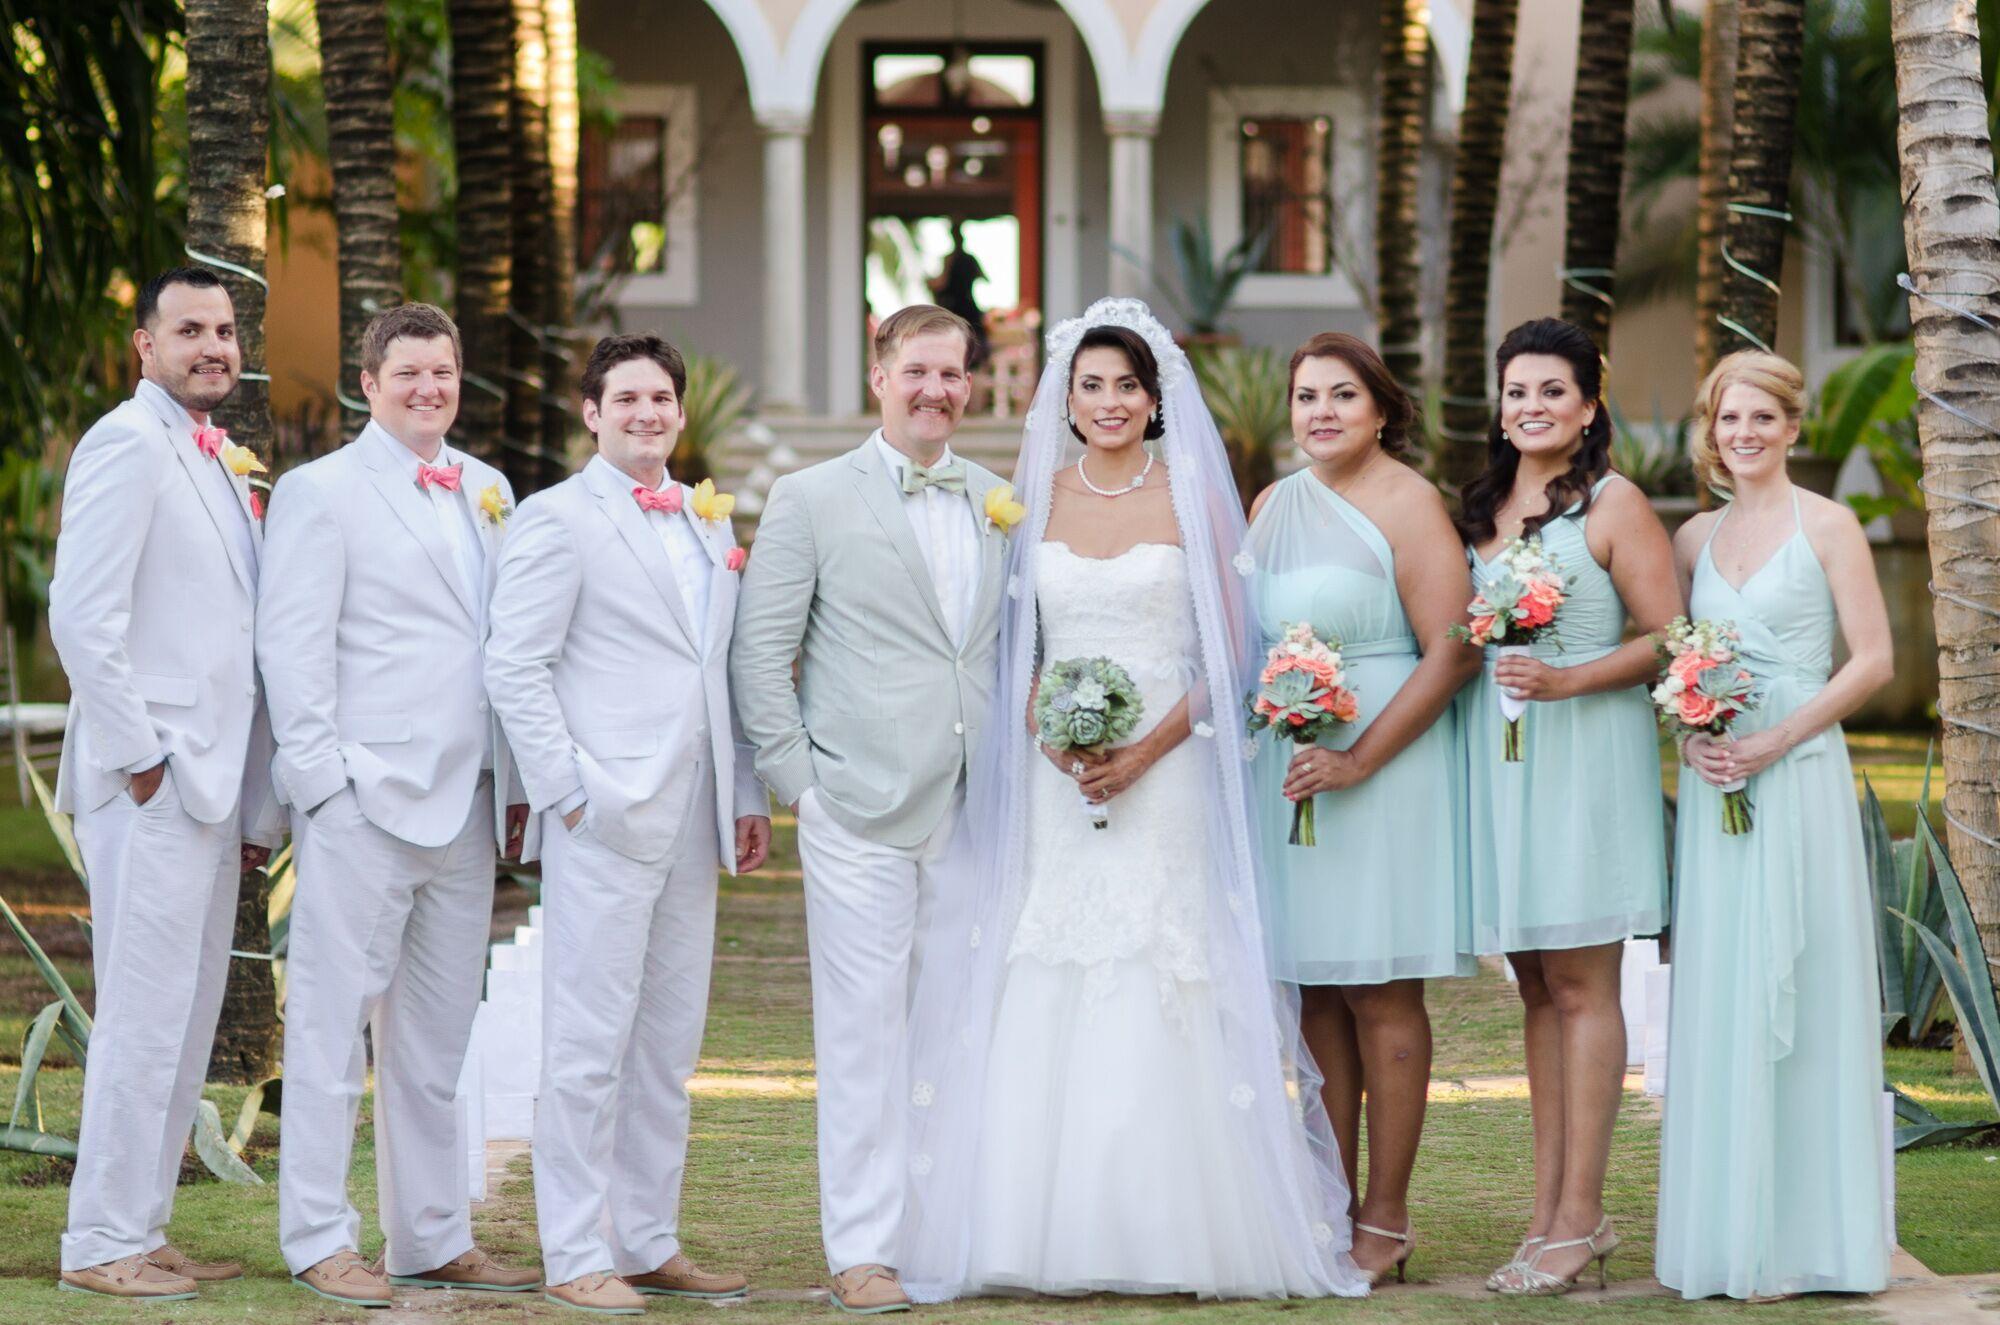 493abab88da Seafoam Green Bridesmaids Dresses - Gomes Weine AG